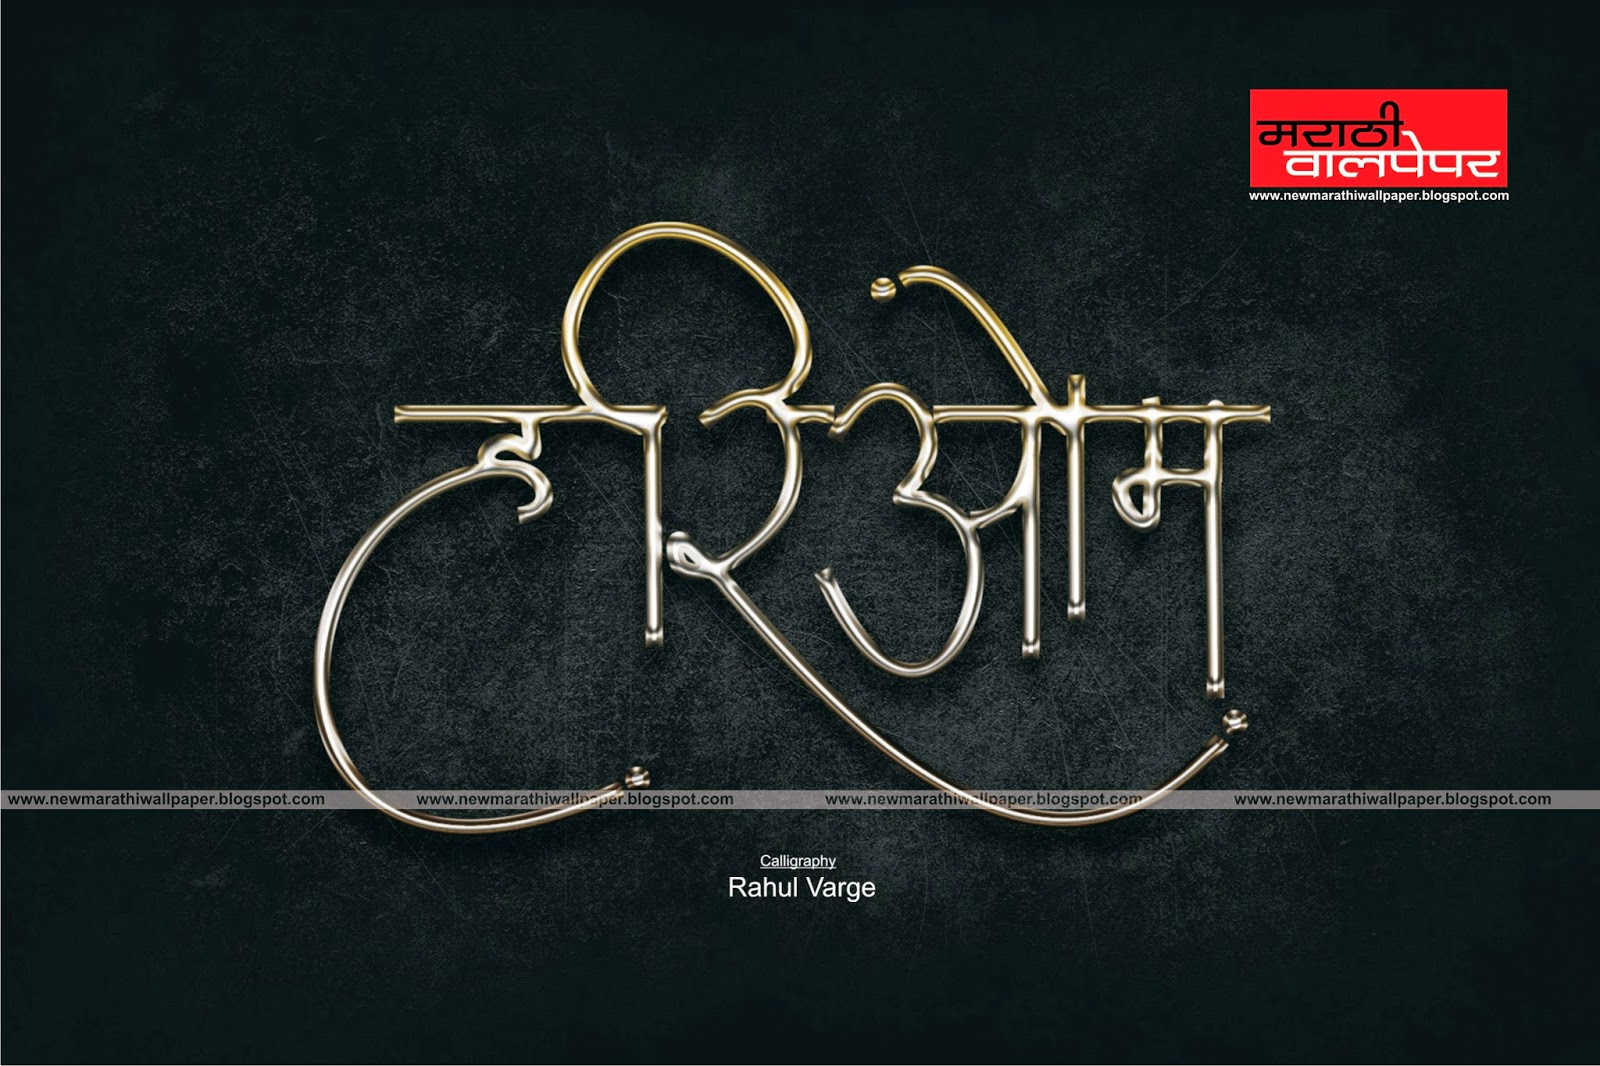 Rahul Name Tattoo Wallpapers  Desktop Background